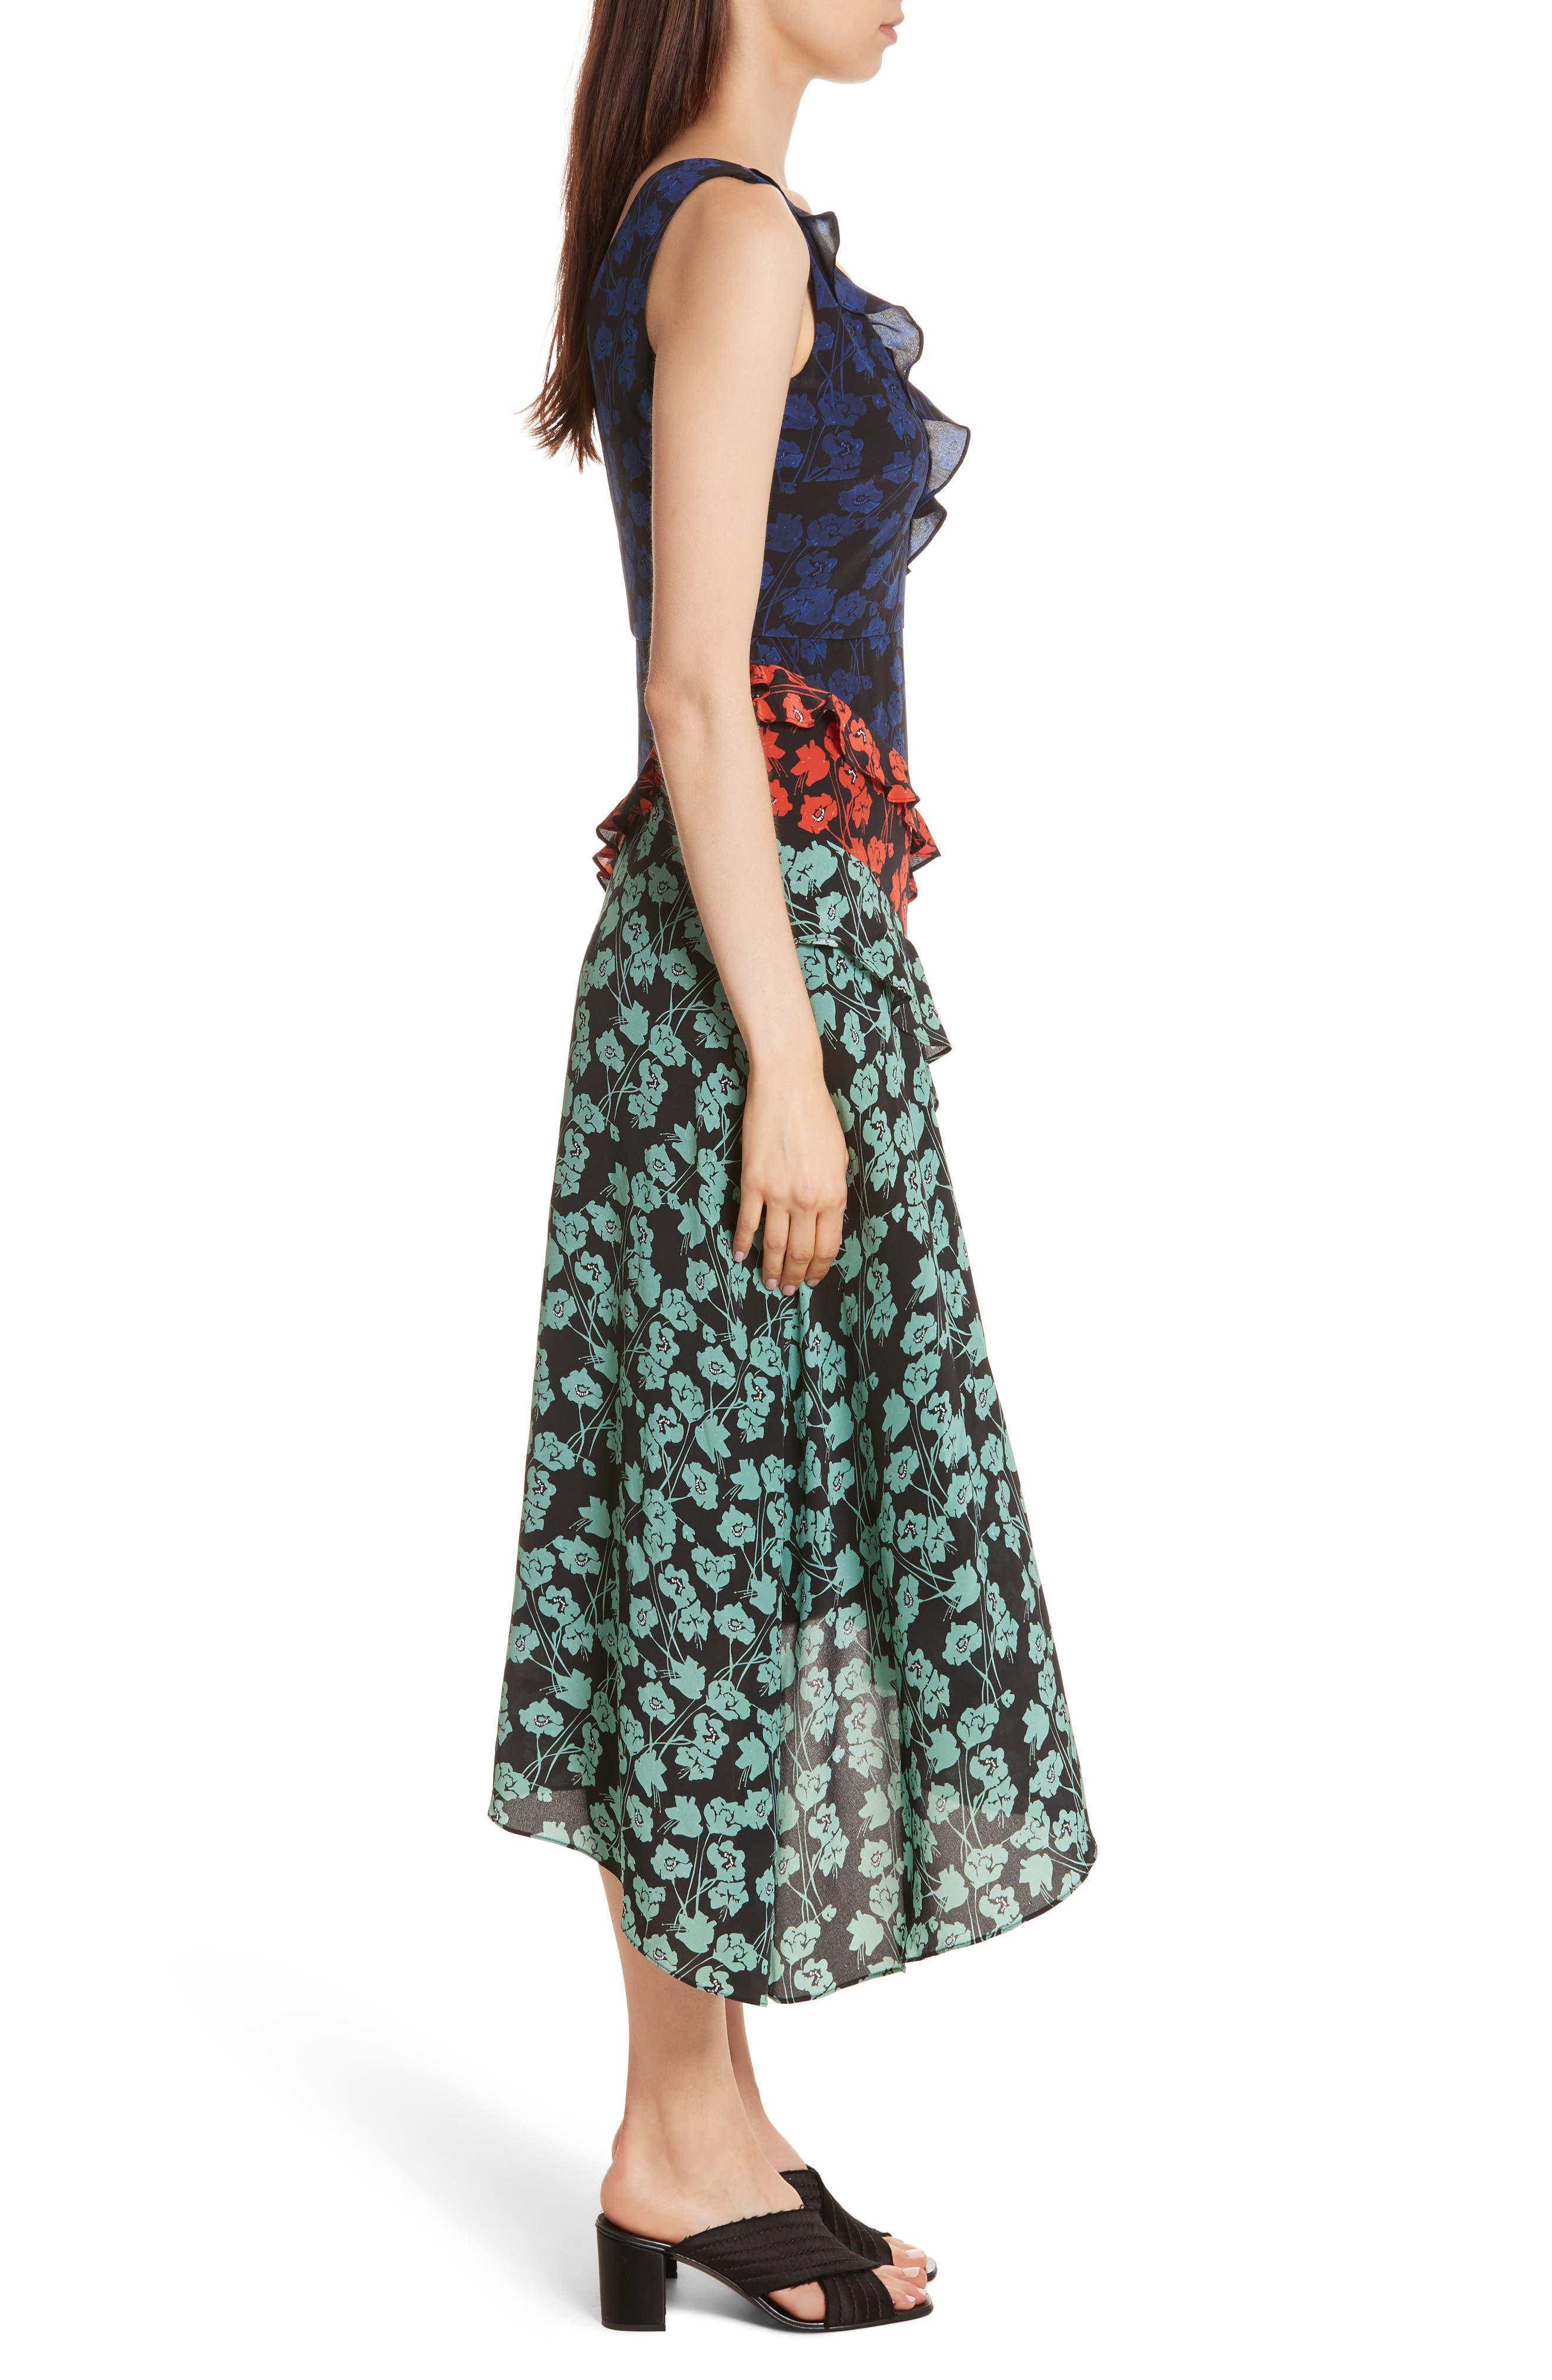 Aggie Floral Print Silk Dress,                             Alternate thumbnail 3, color,                             465